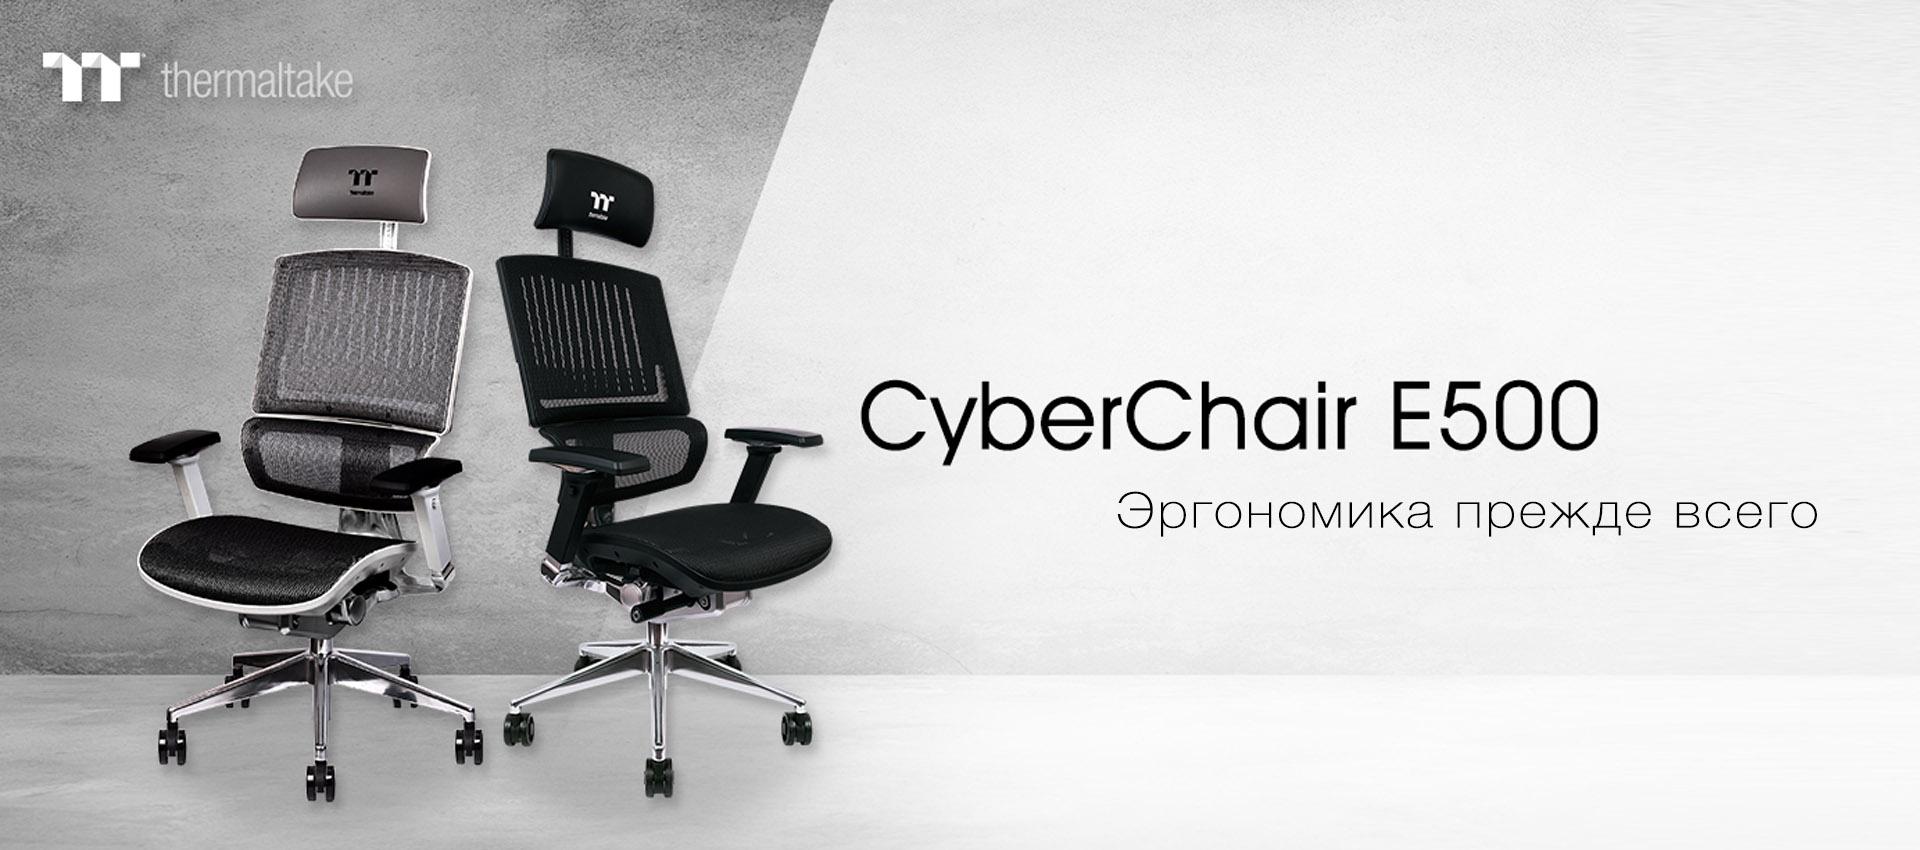 CyberChair